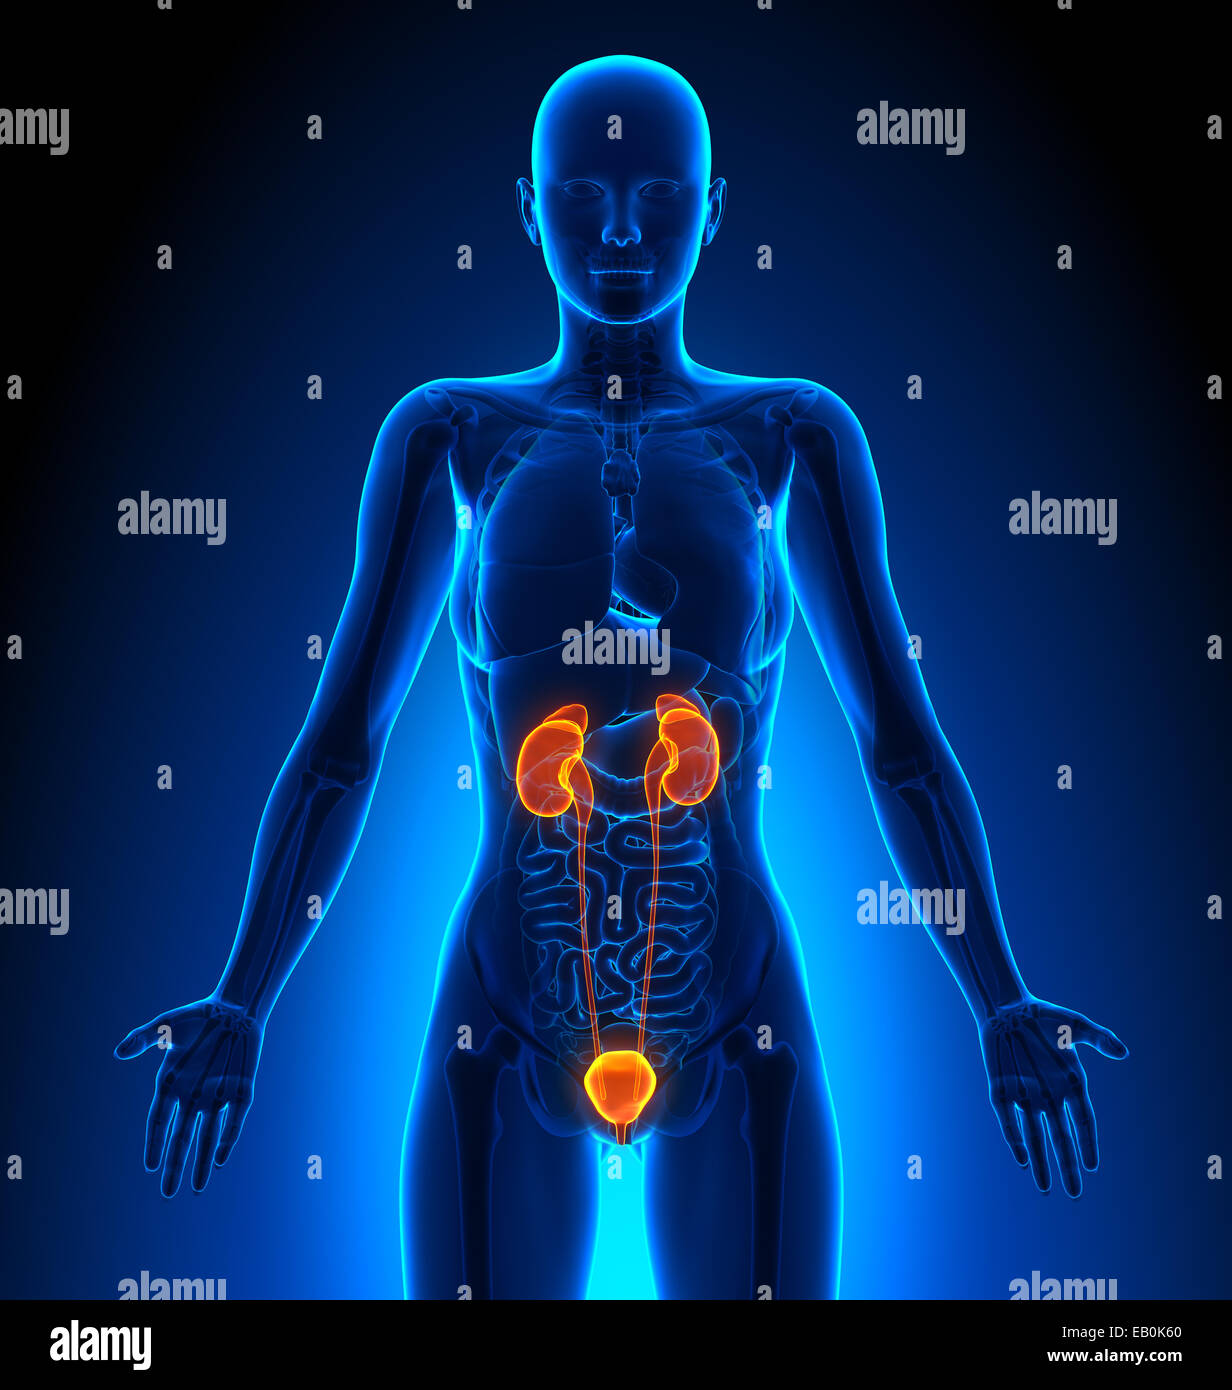 Sistema urinario - órganos femeninos - Anatomía Humana Foto & Imagen ...